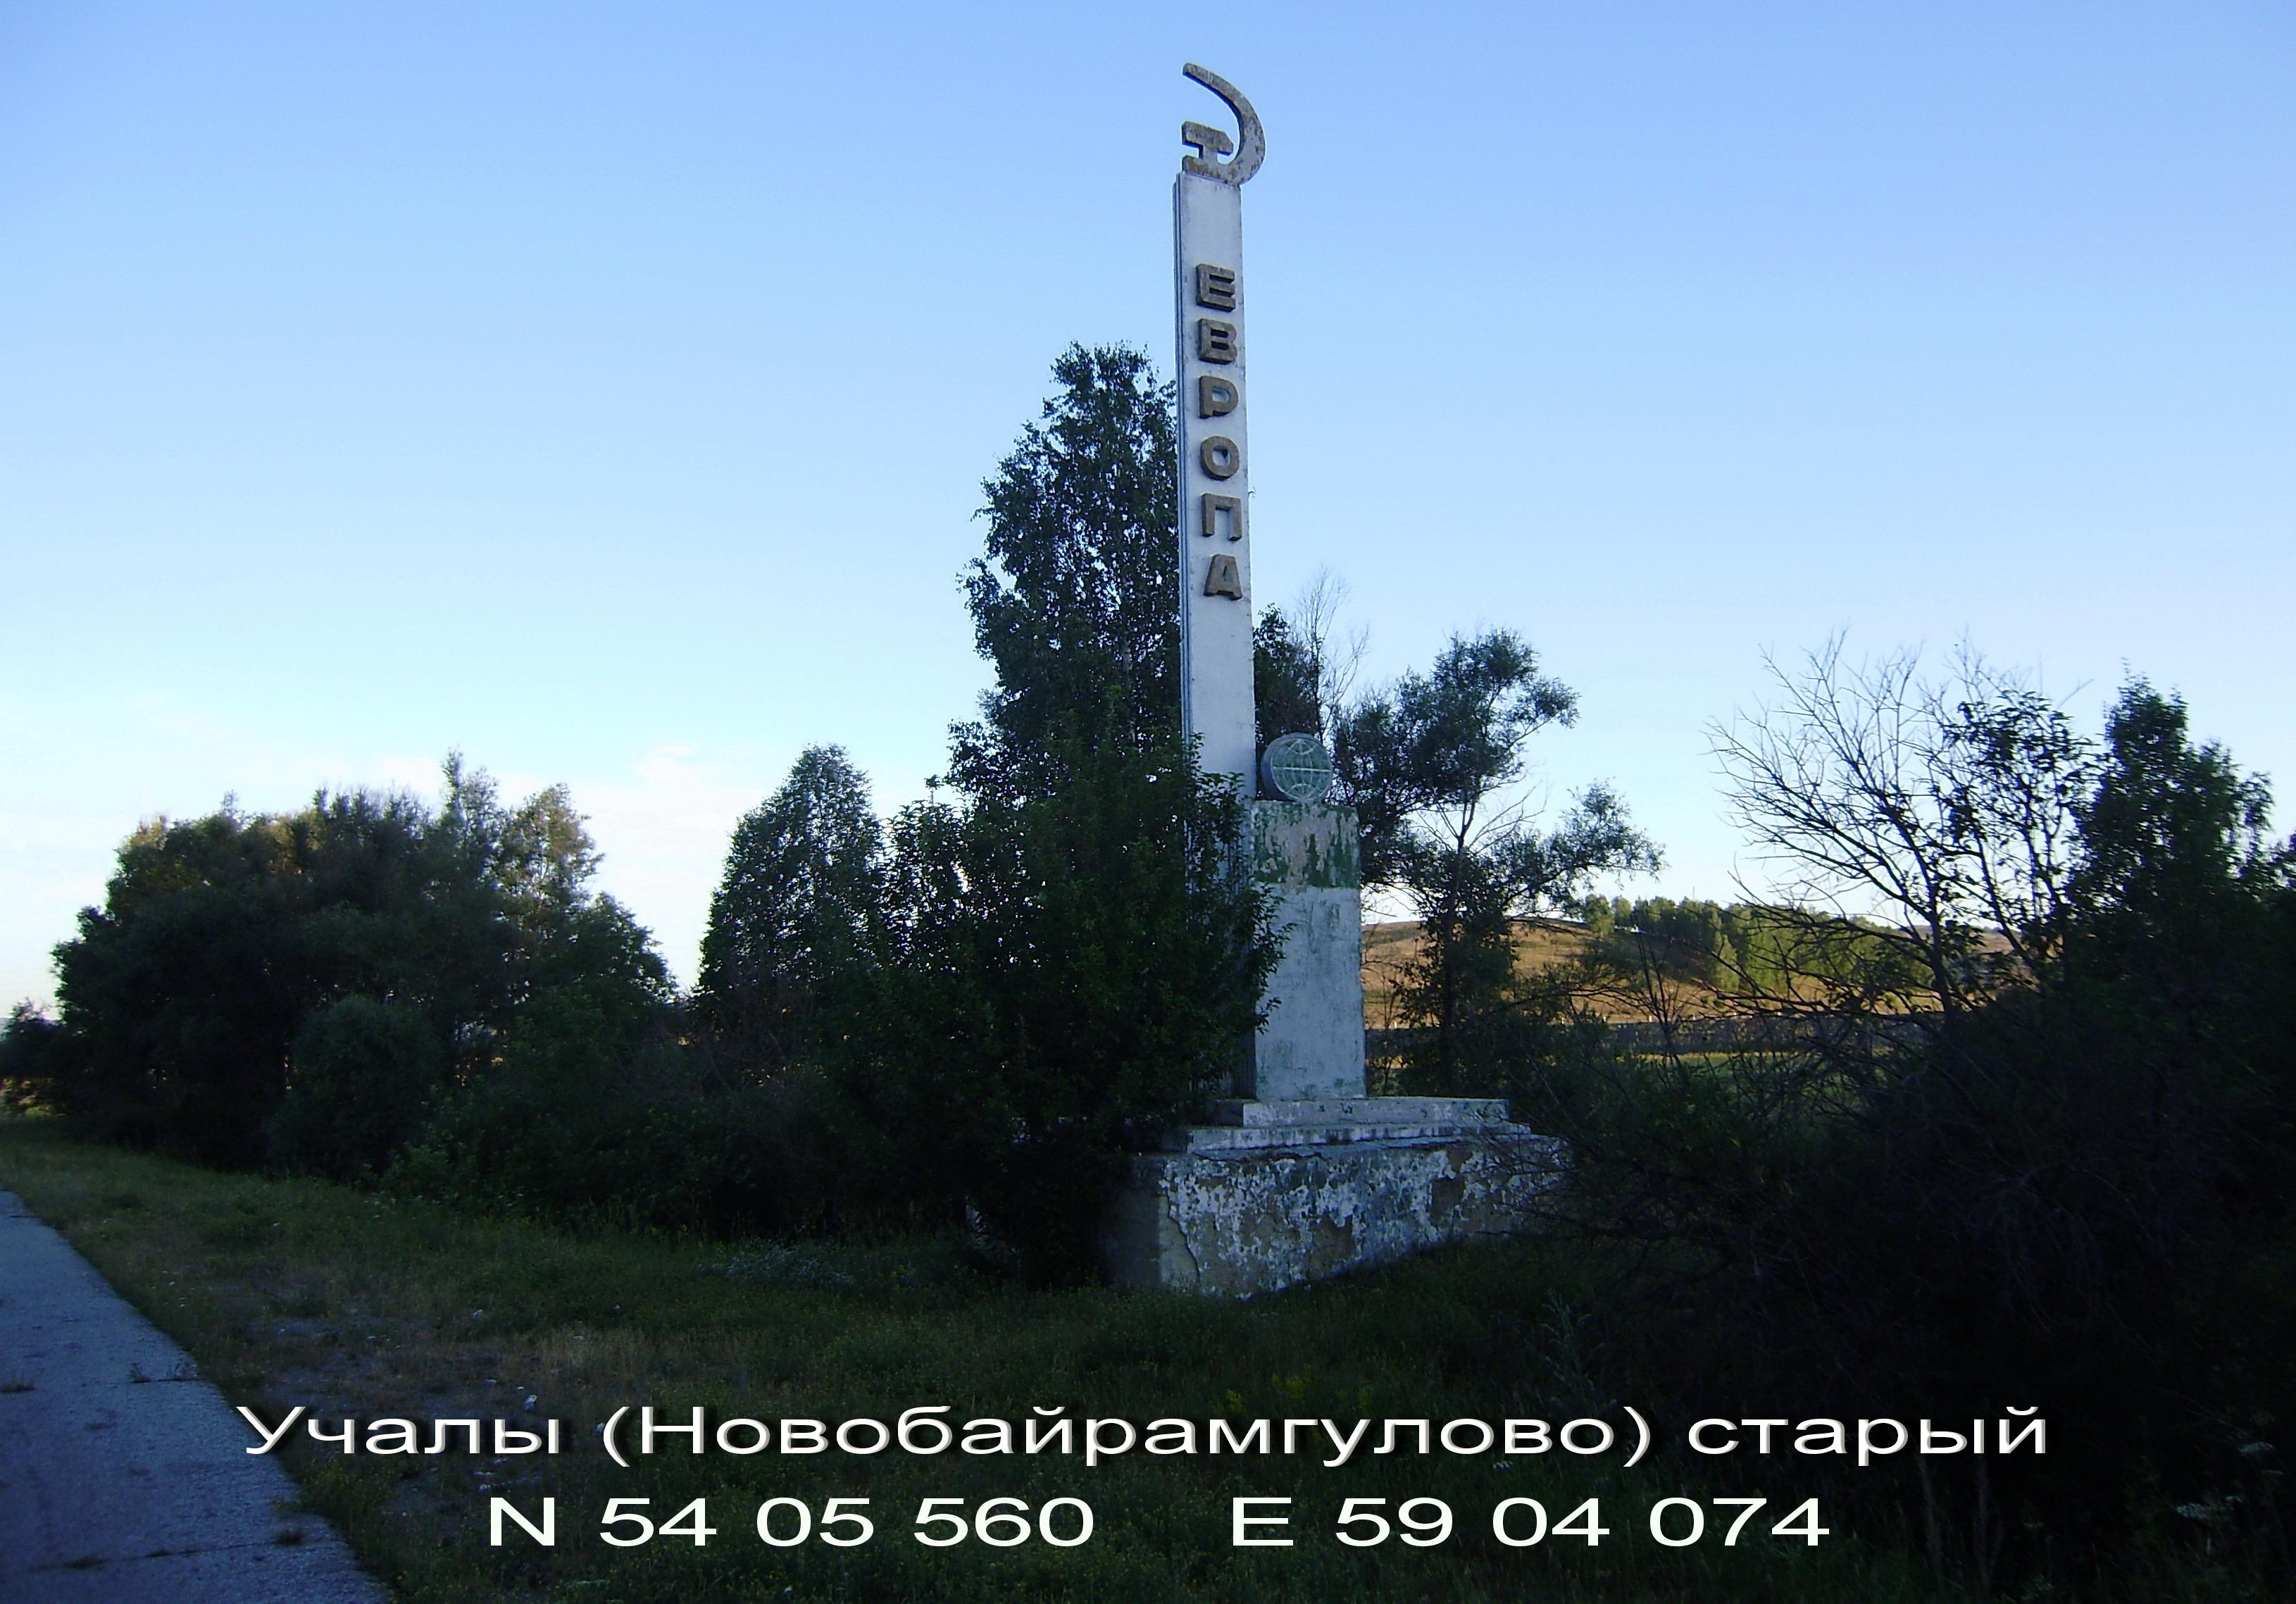 8 - Учалы (Новобайрамгулово)  старый